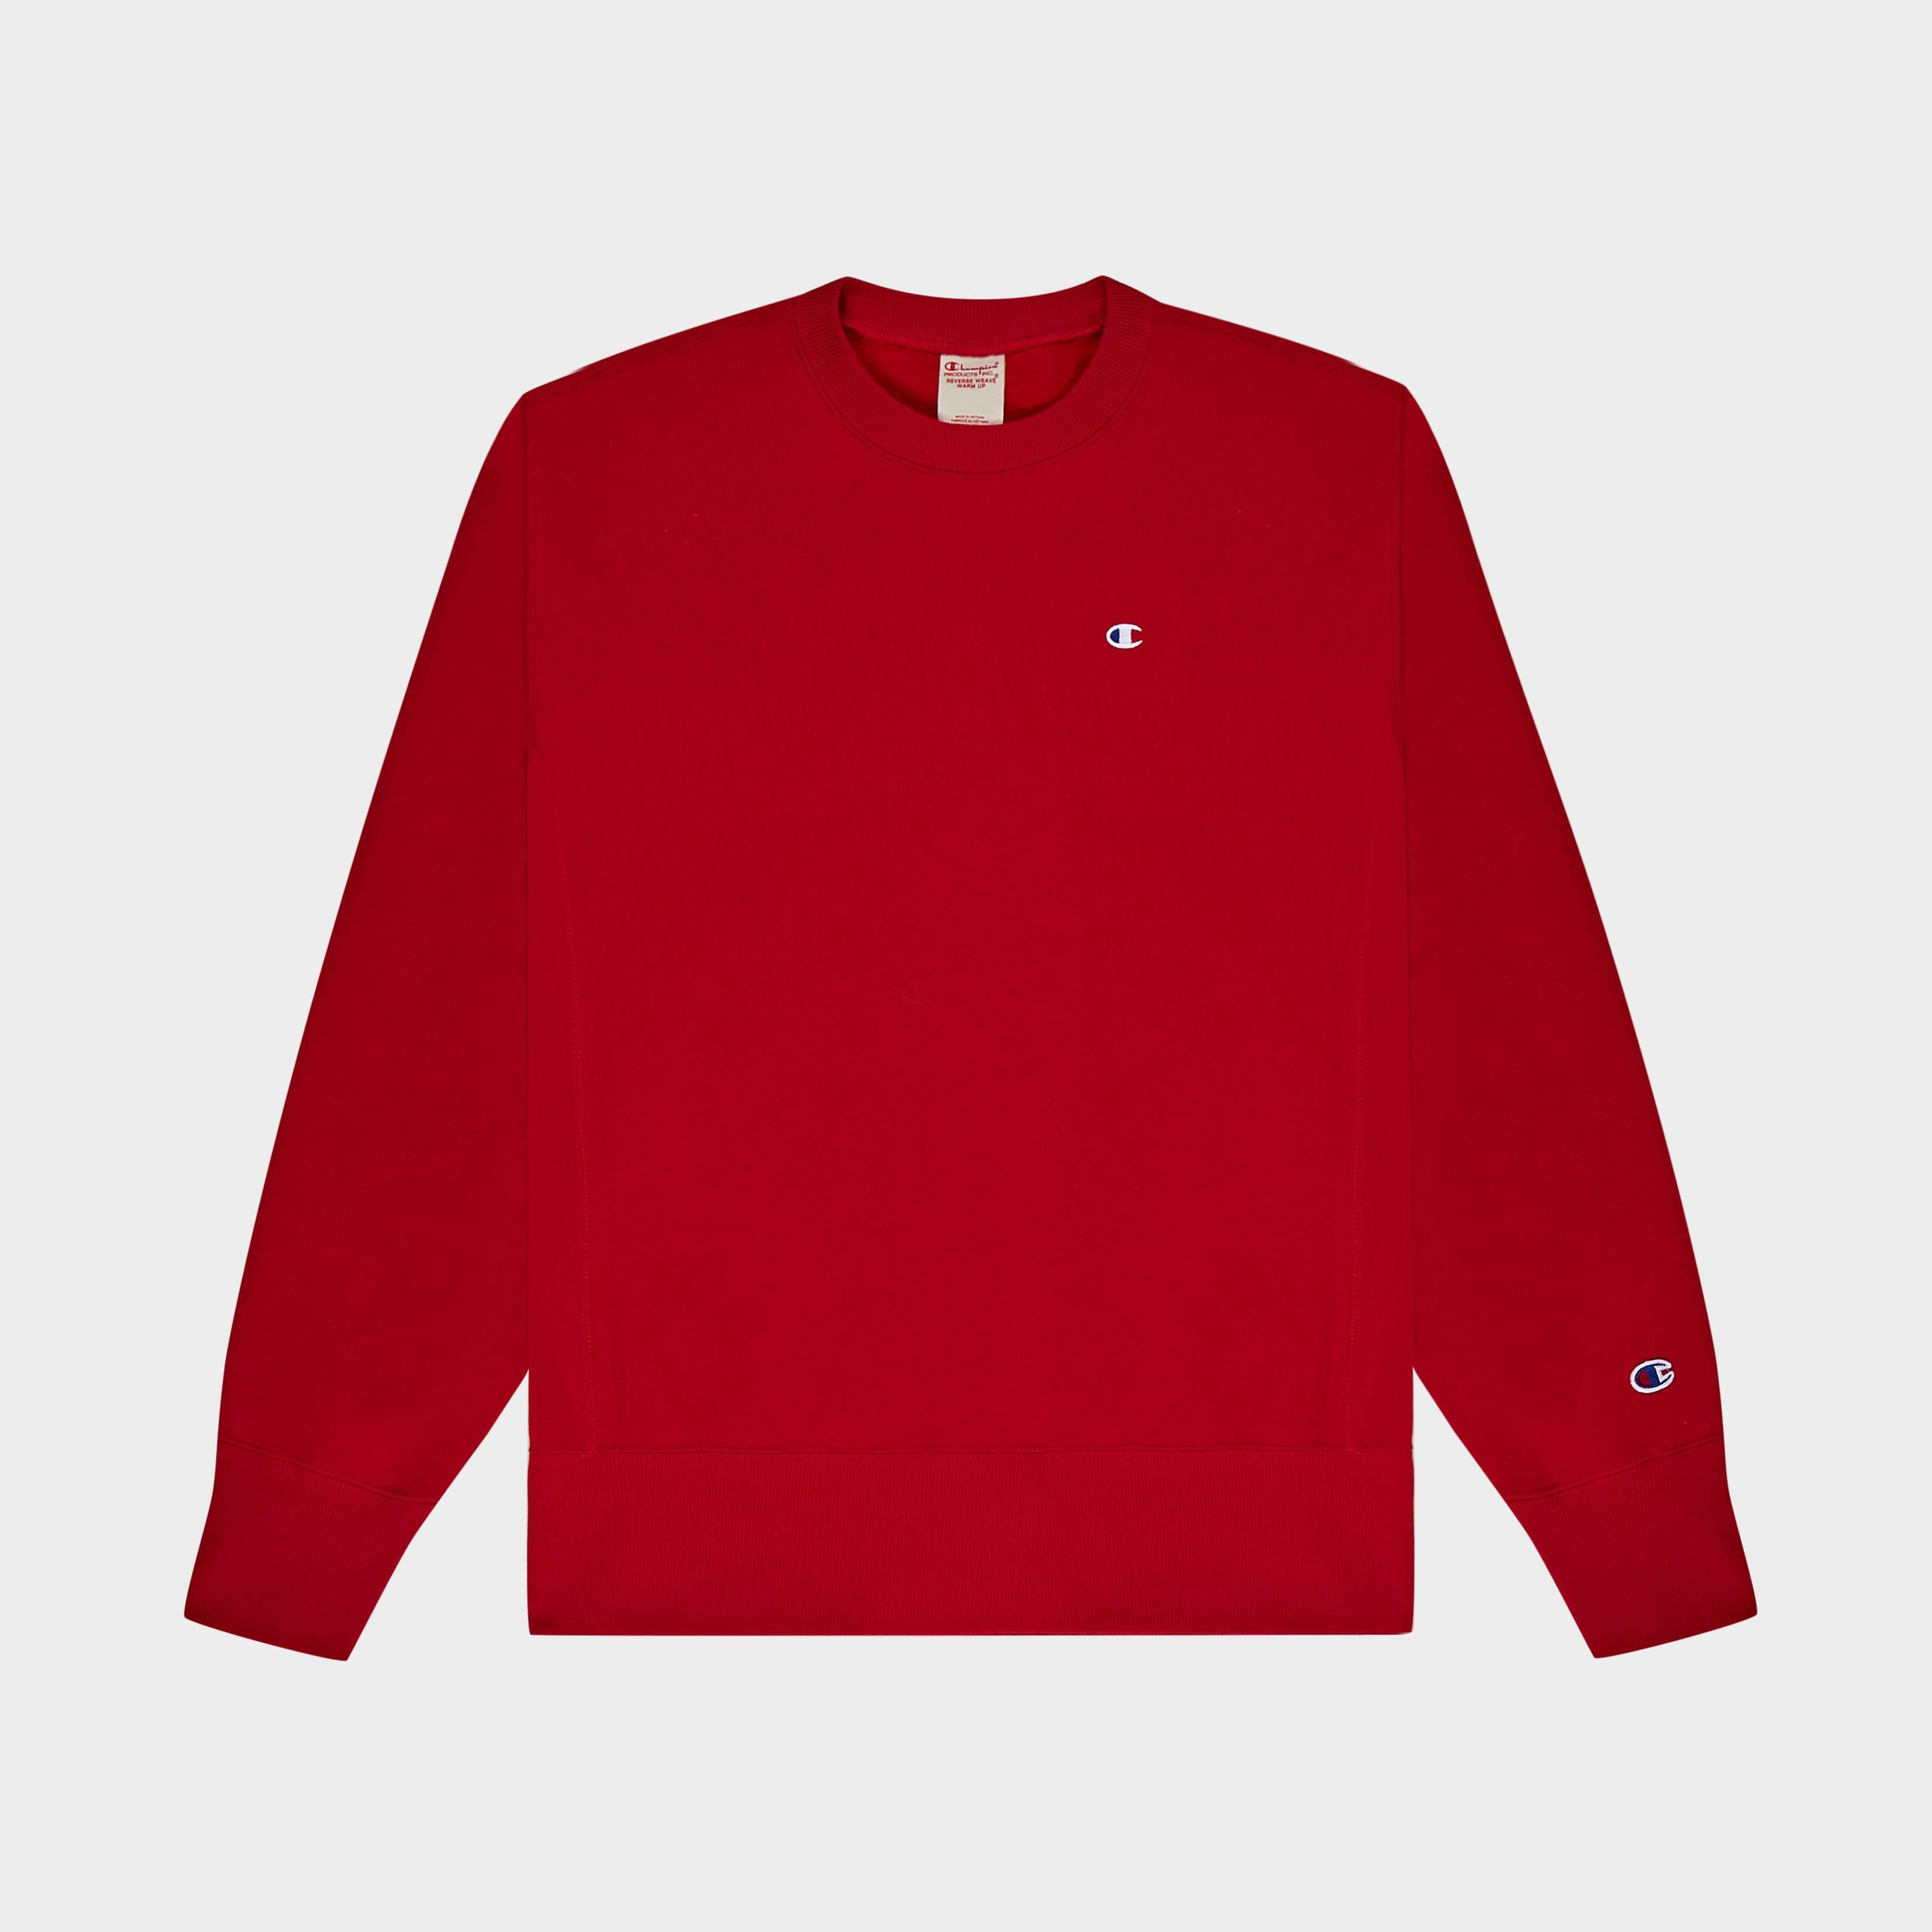 Sweatshirt Champion Crewneck Red Sweatshirt Champion Crewneck Red OZkiXuP